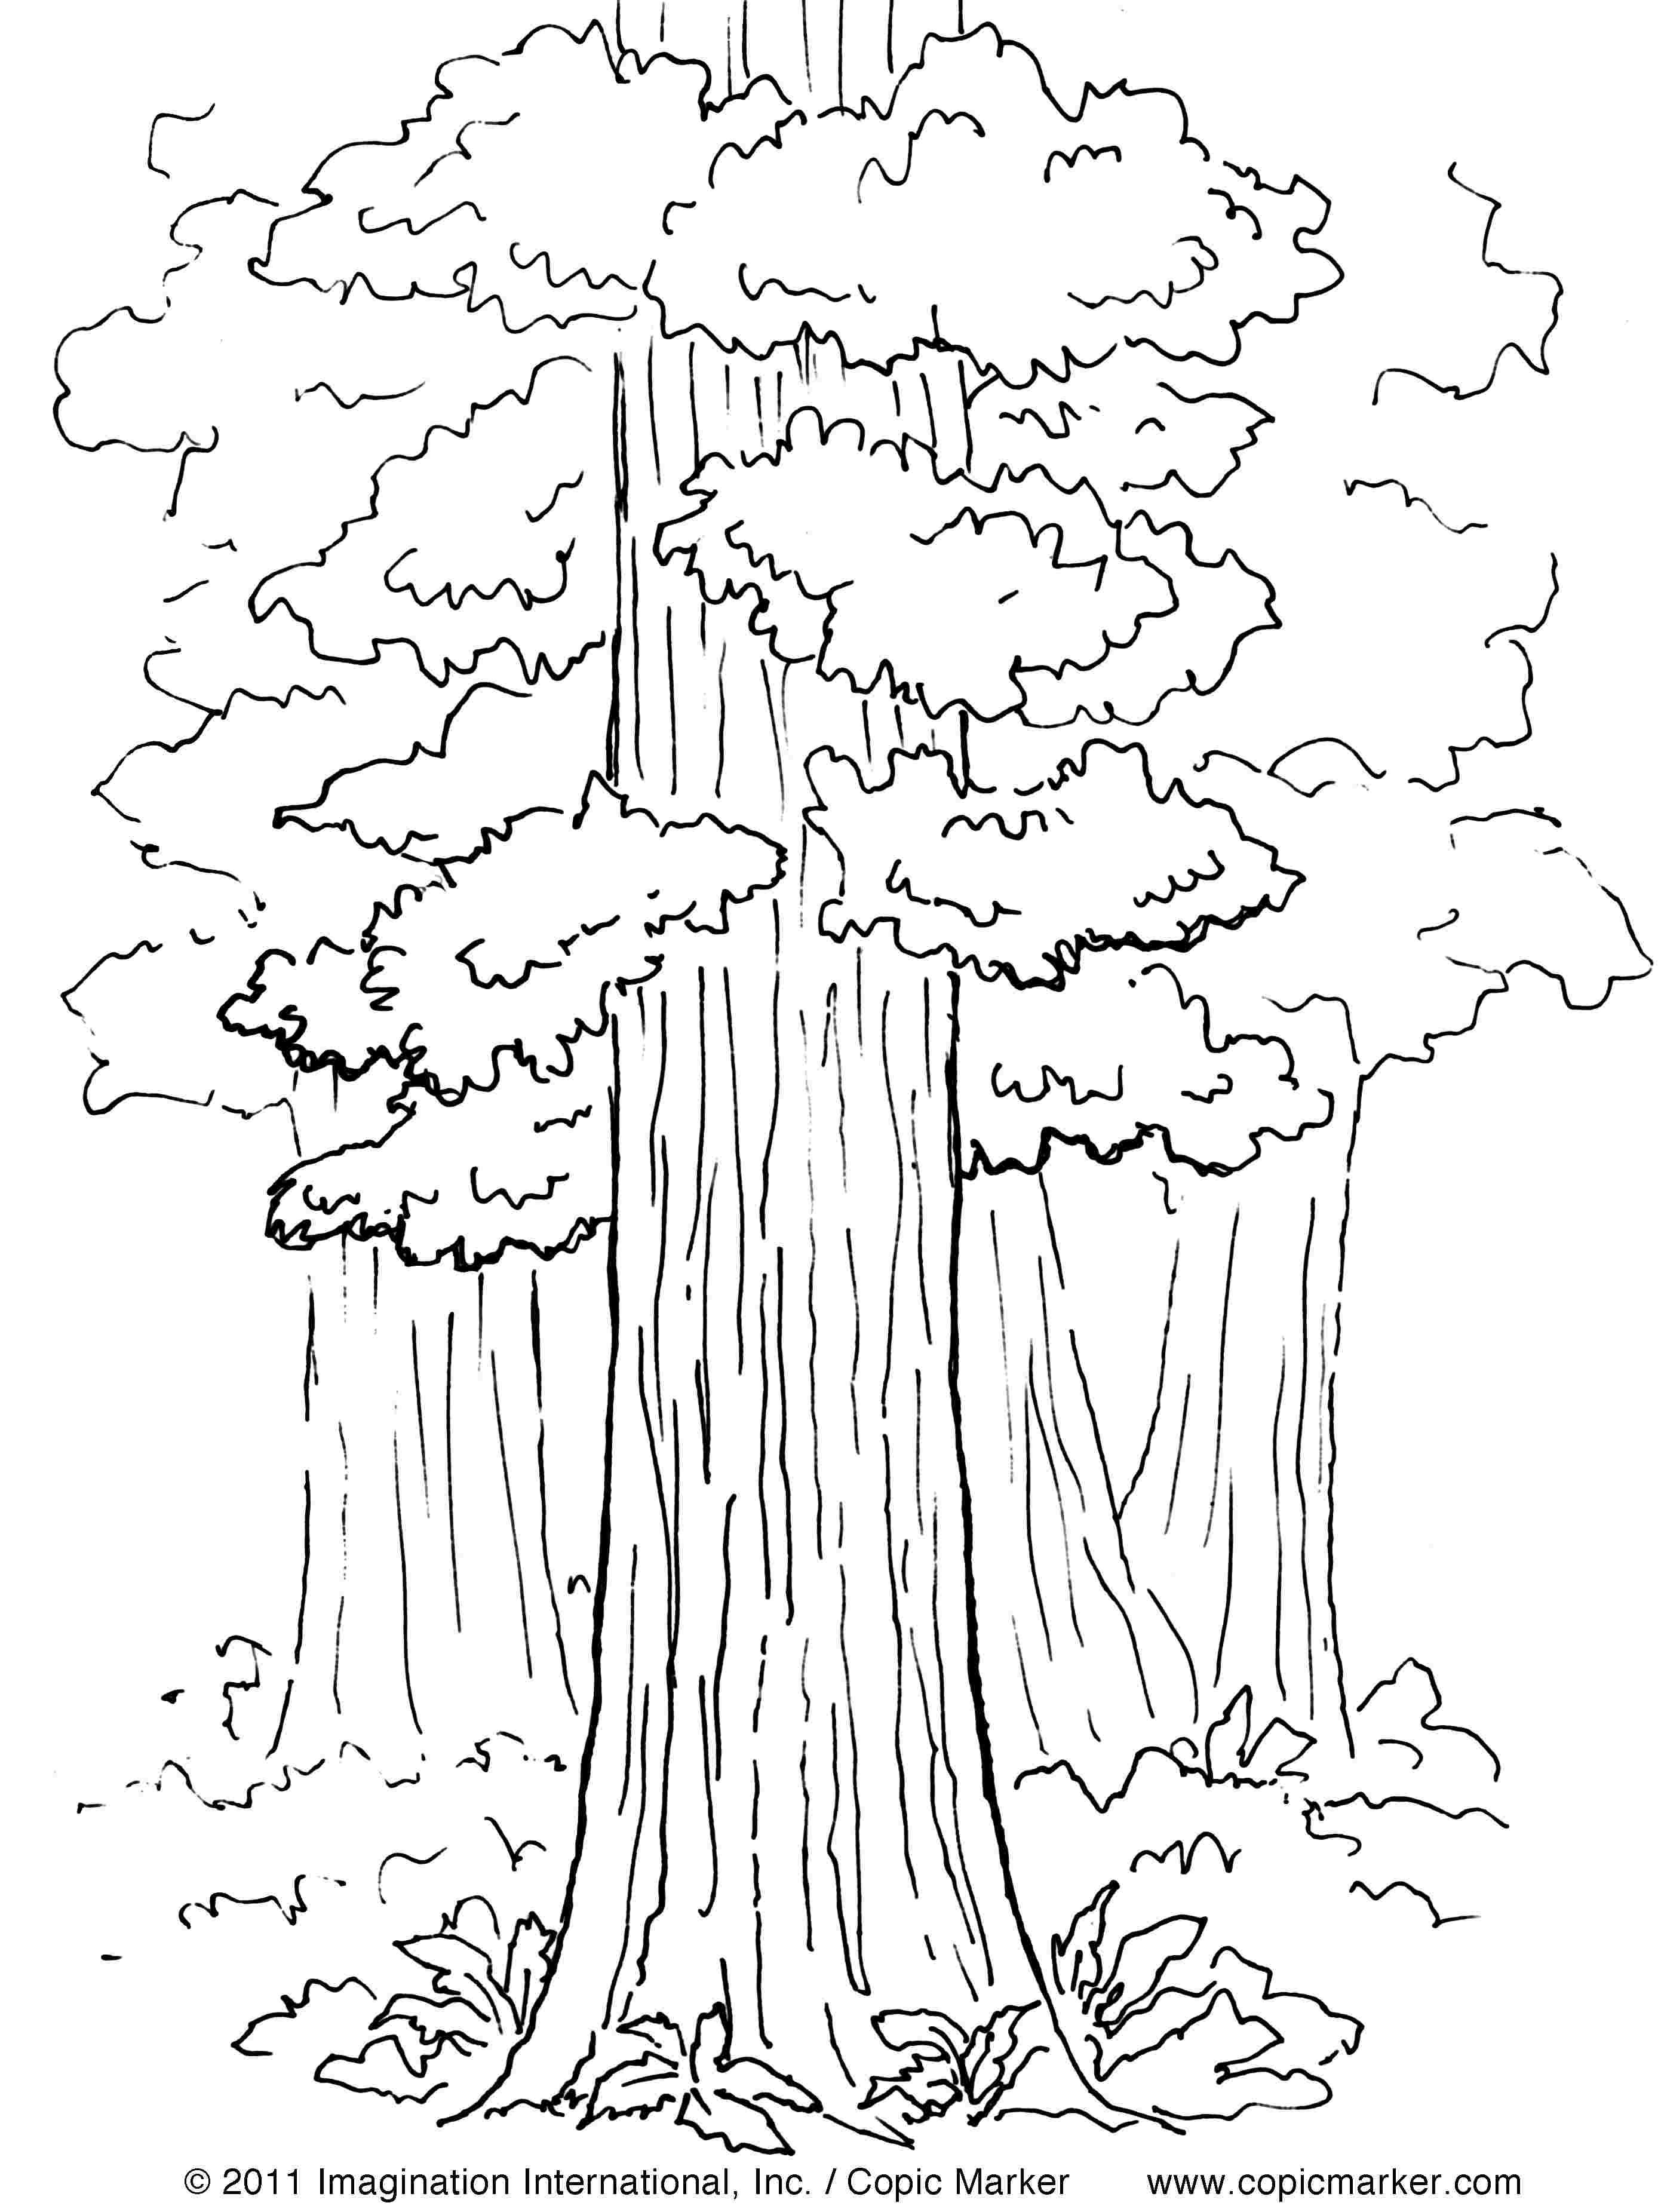 Redwood Forest Coloring Pages Sequoia Sempervirens Sɪˈkɔɪ ə Sɛmpərˈvaɪrənz Is The Sole Li Tree Coloring Page Leaf Coloring Page Coloring Pages